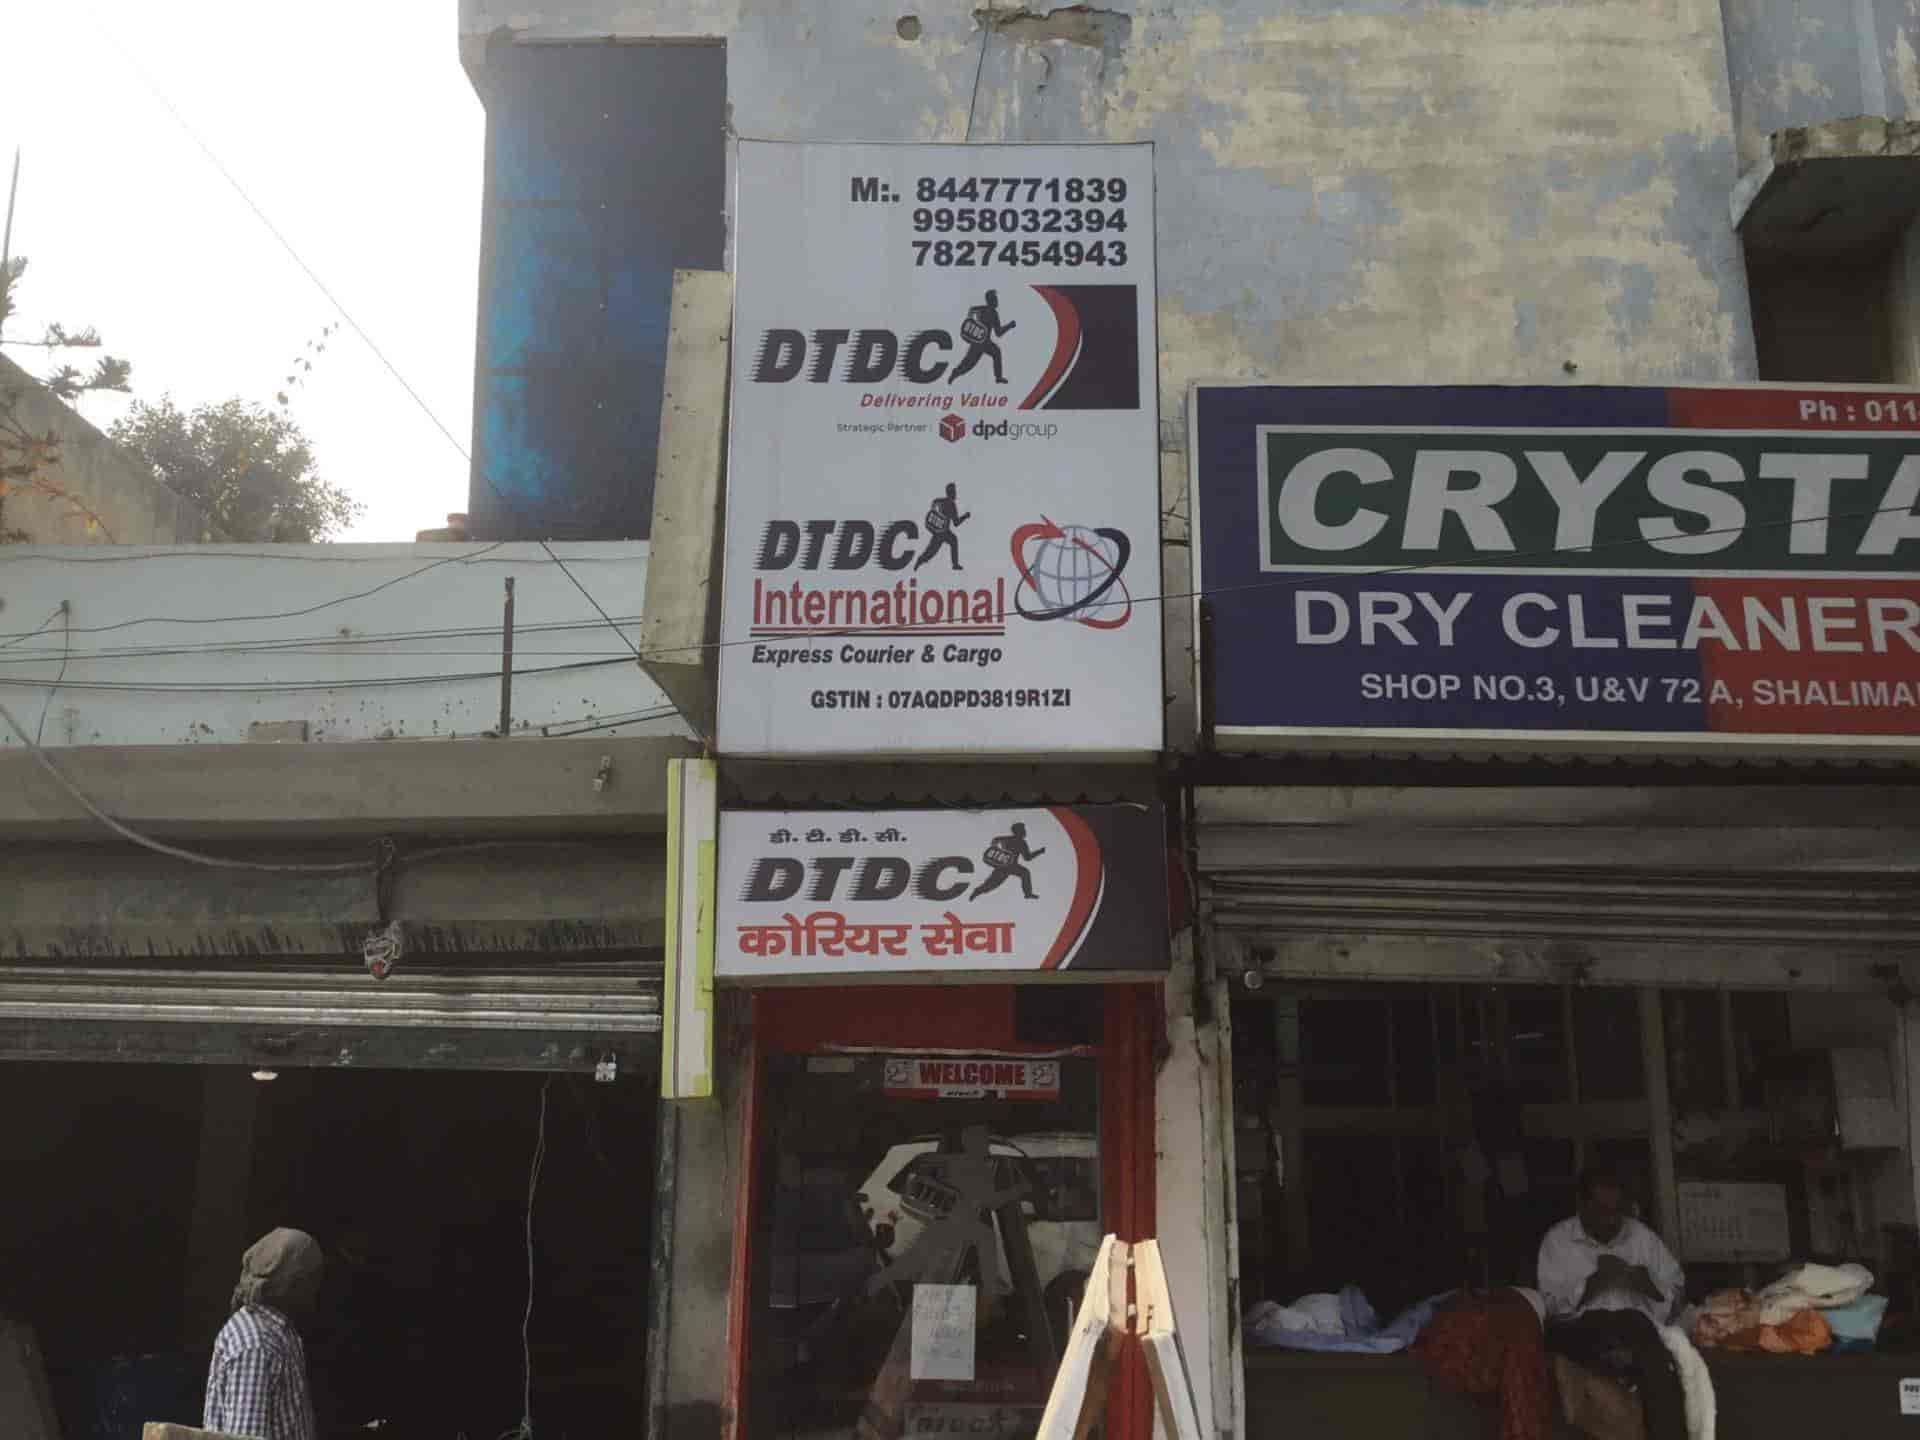 Dtdc Express Ltd Shalimar Bagh Courier Services In Delhi Justdial